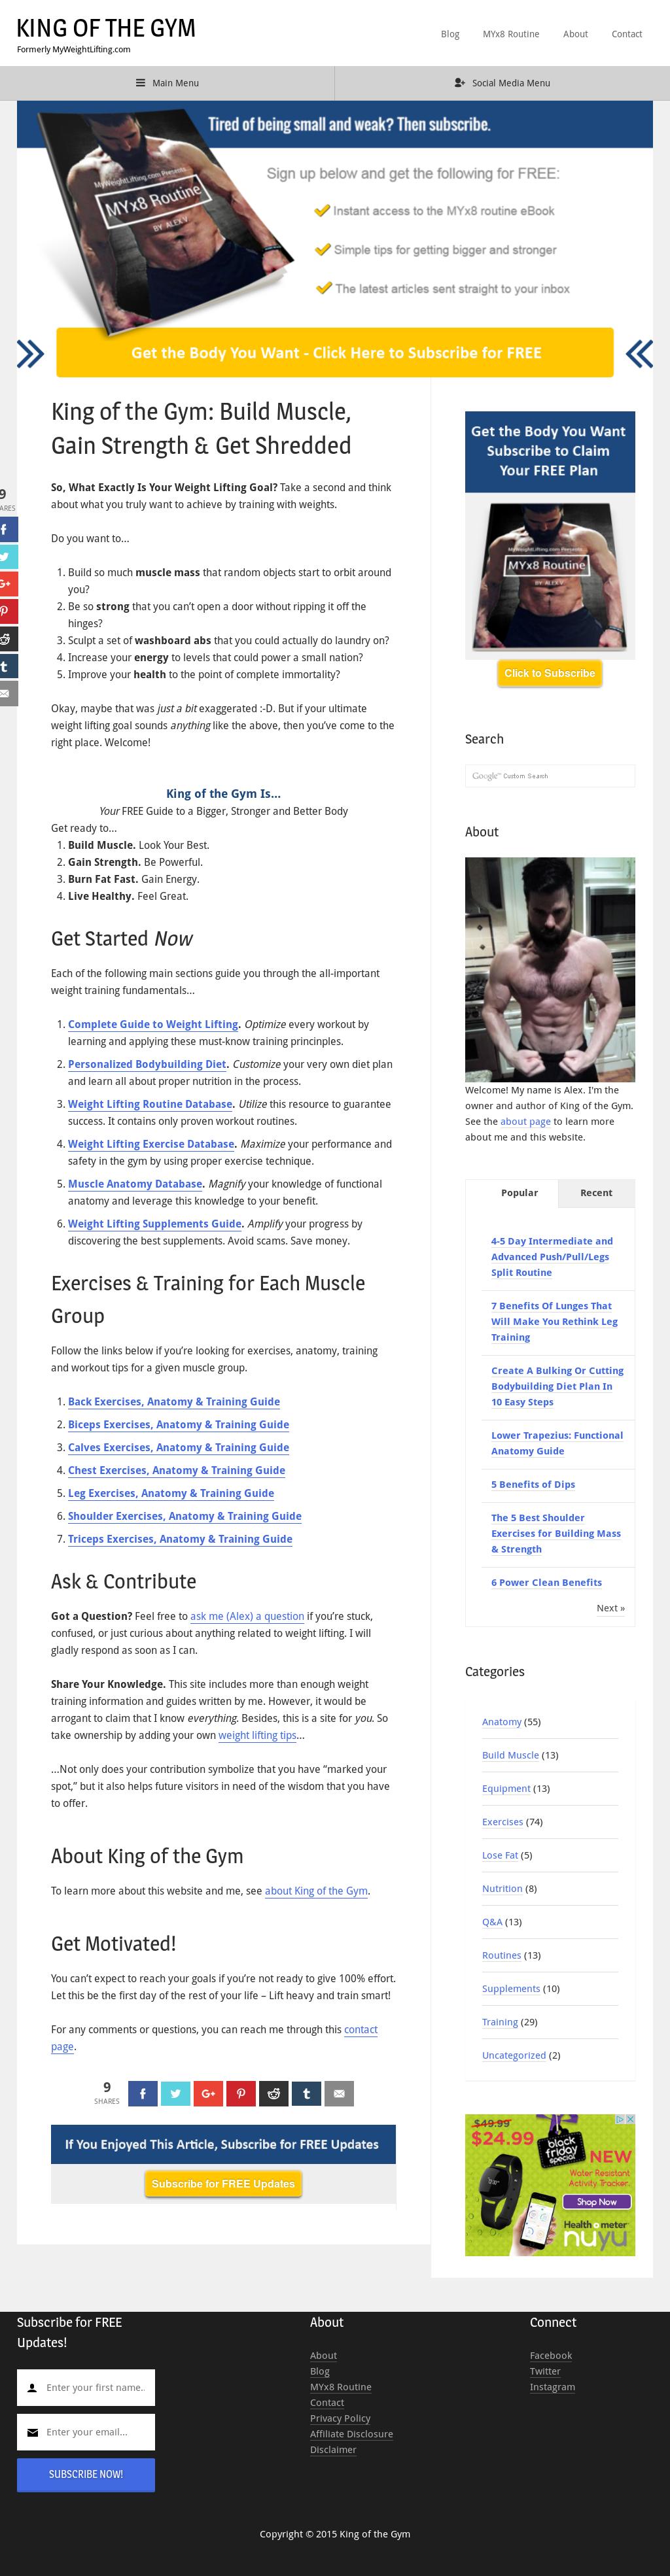 Kingofthegym com - Currently Myweightlifting Competitors